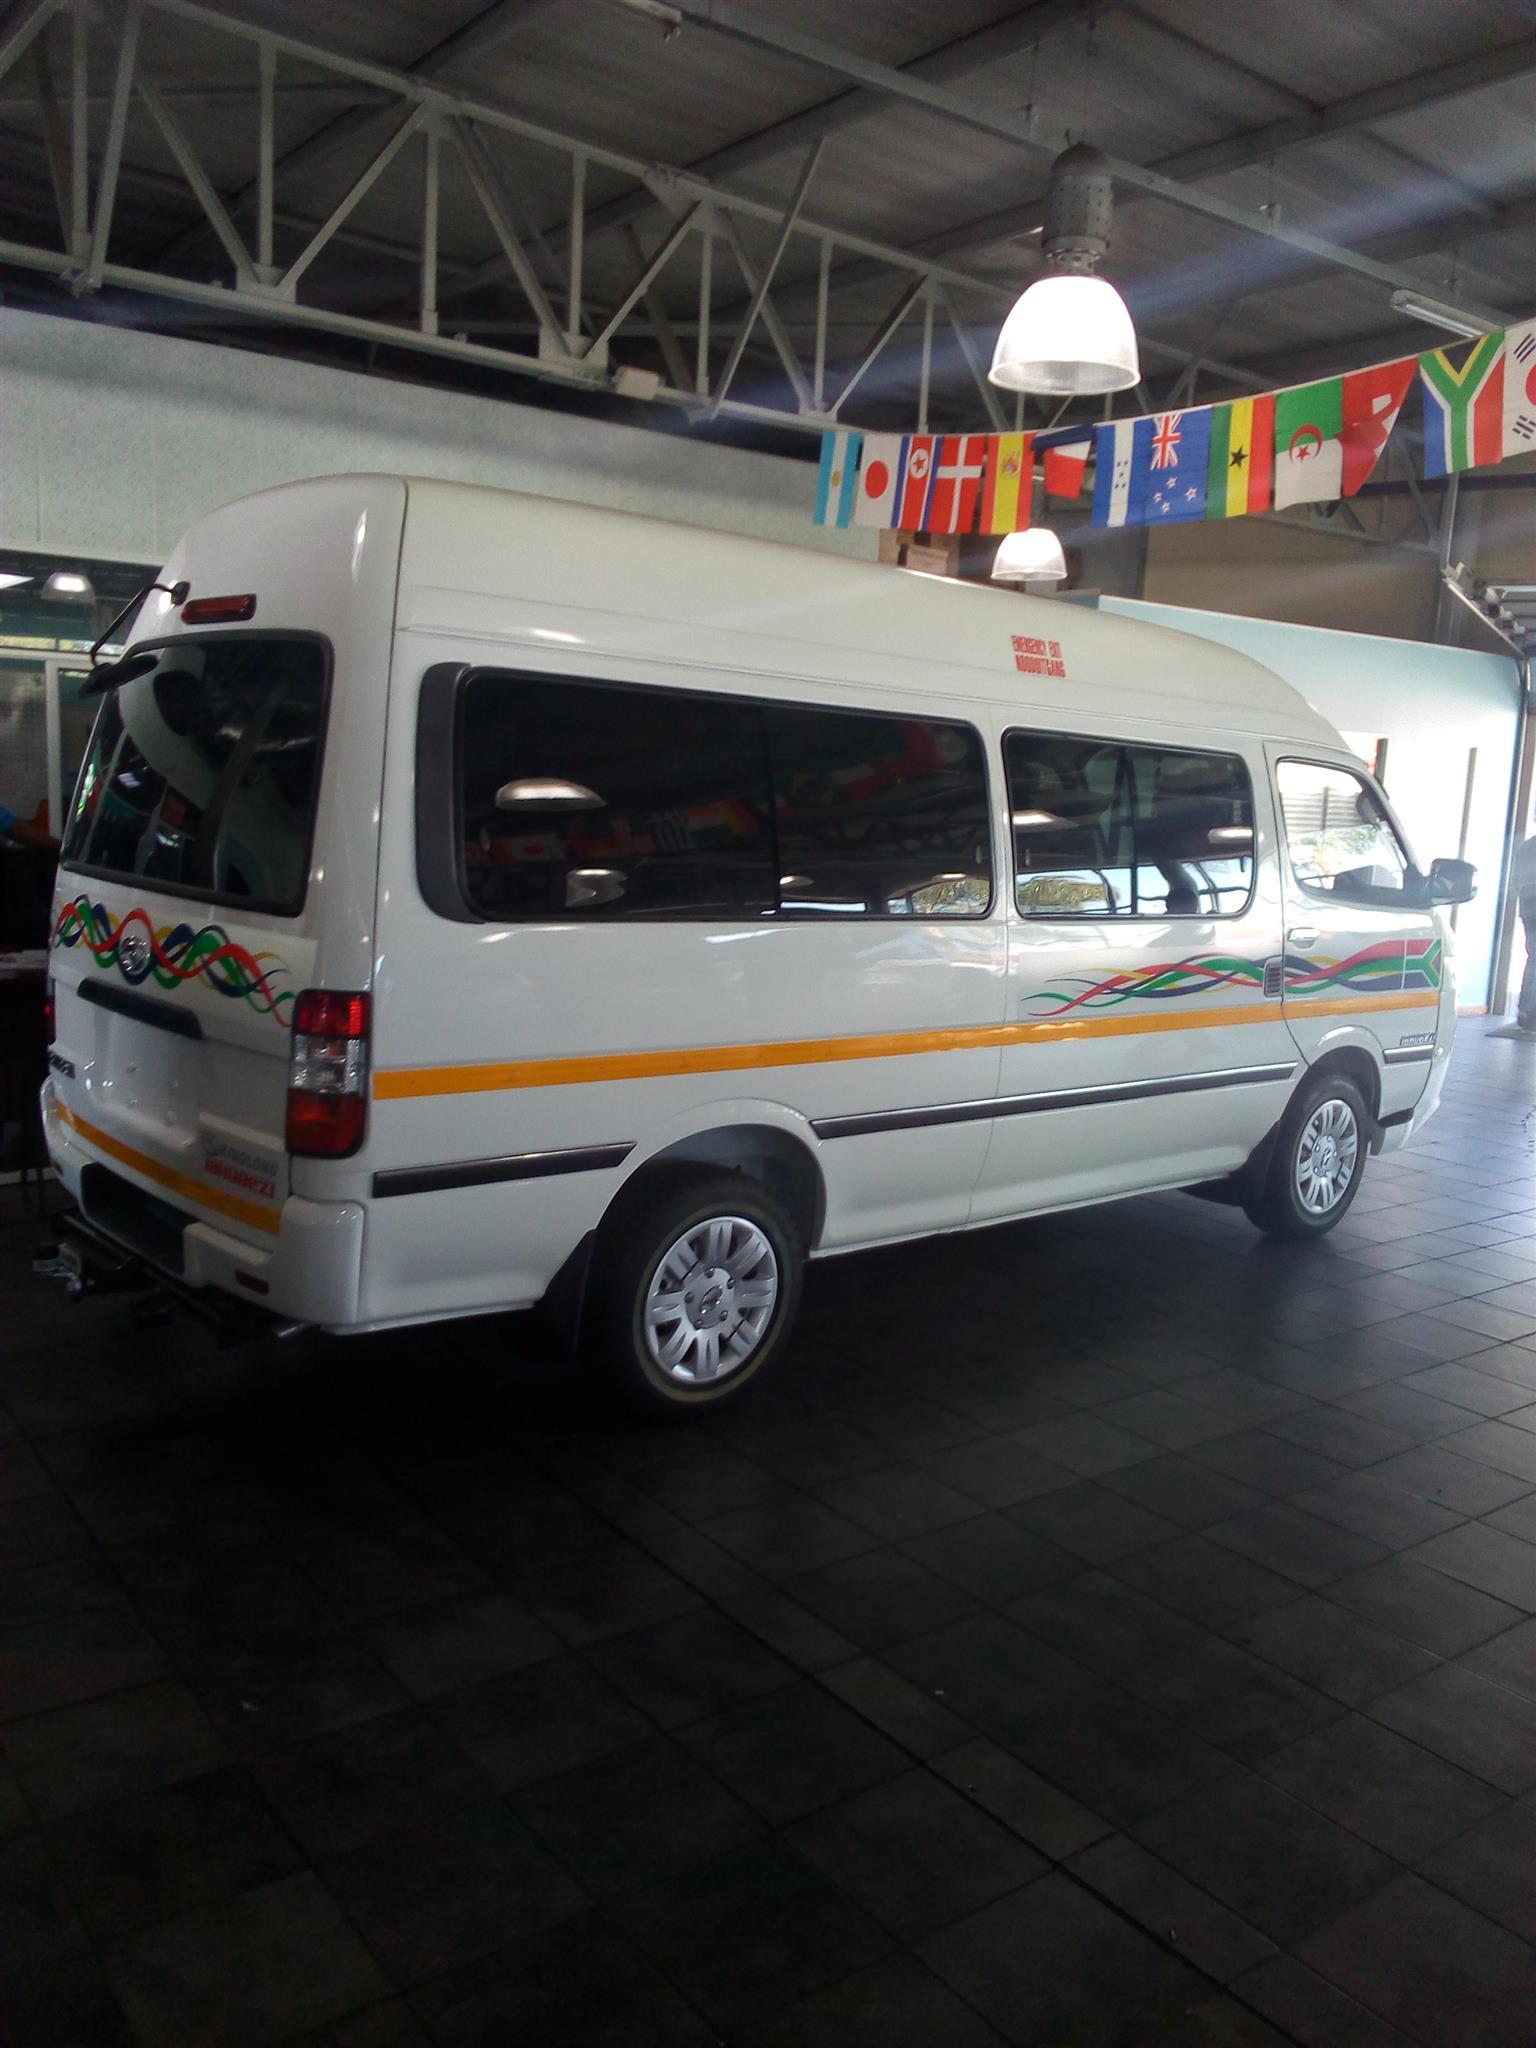 2020 Golden Dragon Ikhumbi